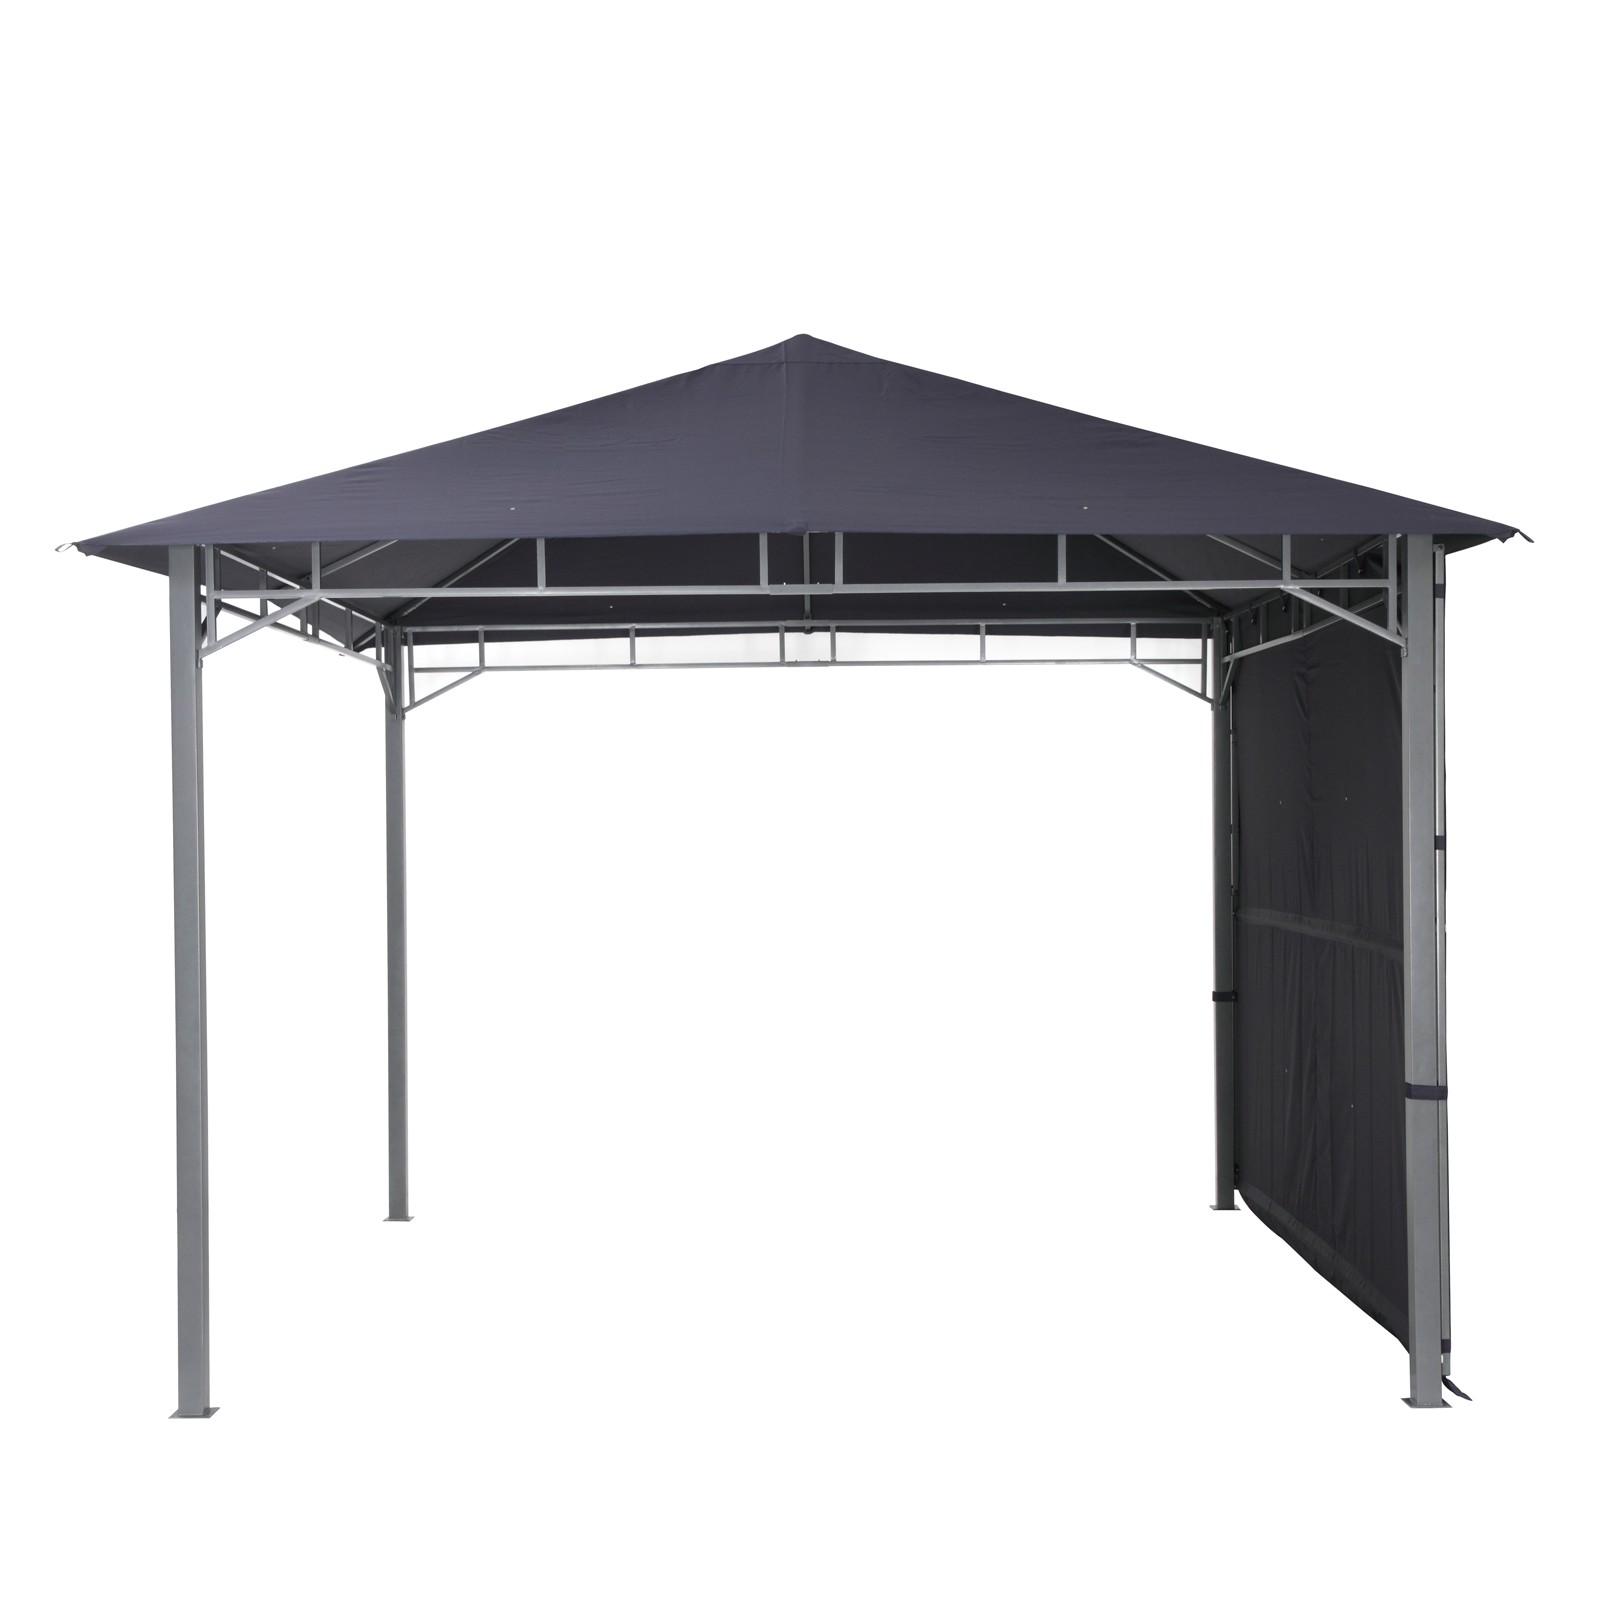 tepro pavillon 3x3 faltpavillon gartenpavillon garten partyzelt lehua dunkelblau ebay. Black Bedroom Furniture Sets. Home Design Ideas